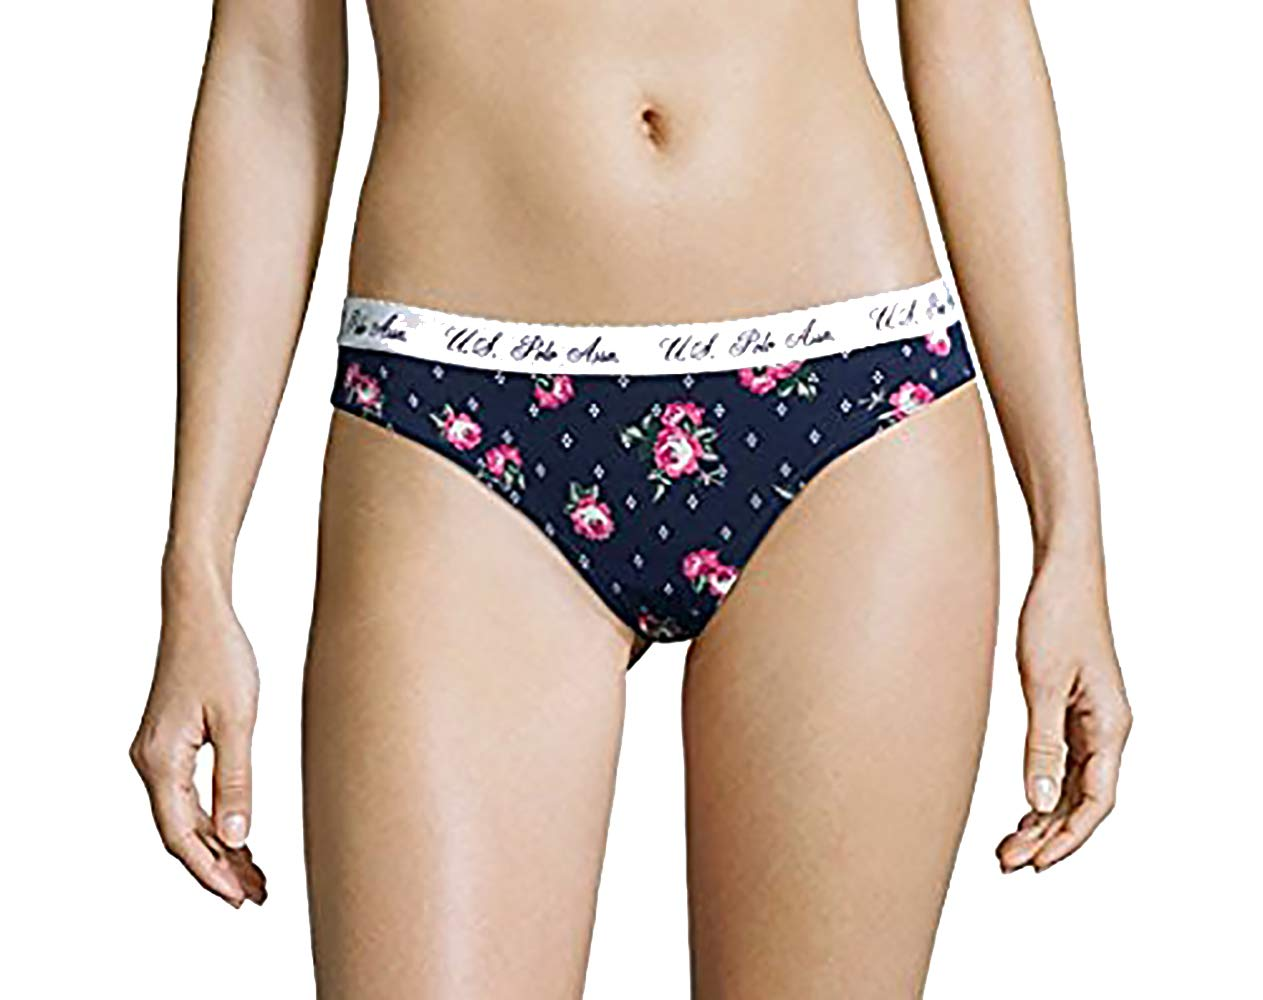 U.S. Polo Assn. Womens Multi Pack Hi Cut Elastic Waist No Panty Lines Thong Panties